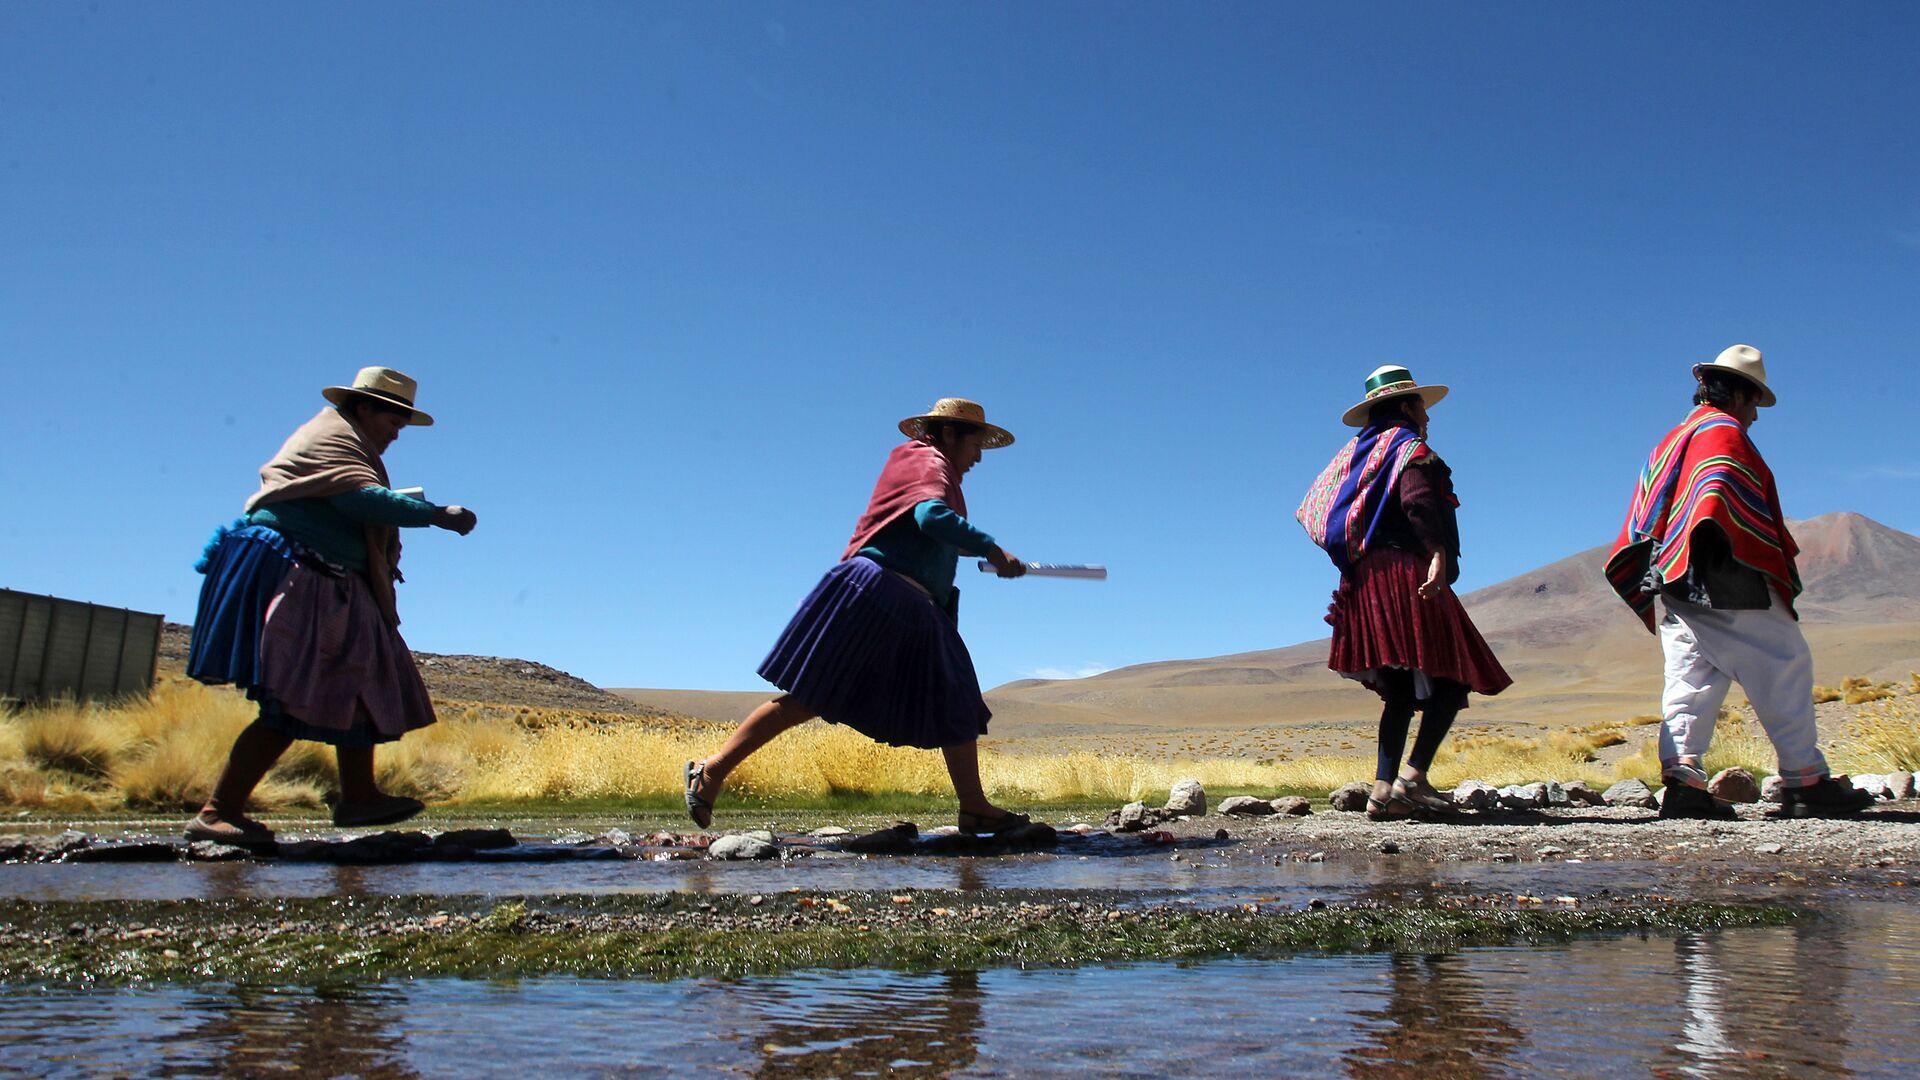 Indígenas aimará en Bolivia - Sputnik Mundo, 1920, 25.06.2021